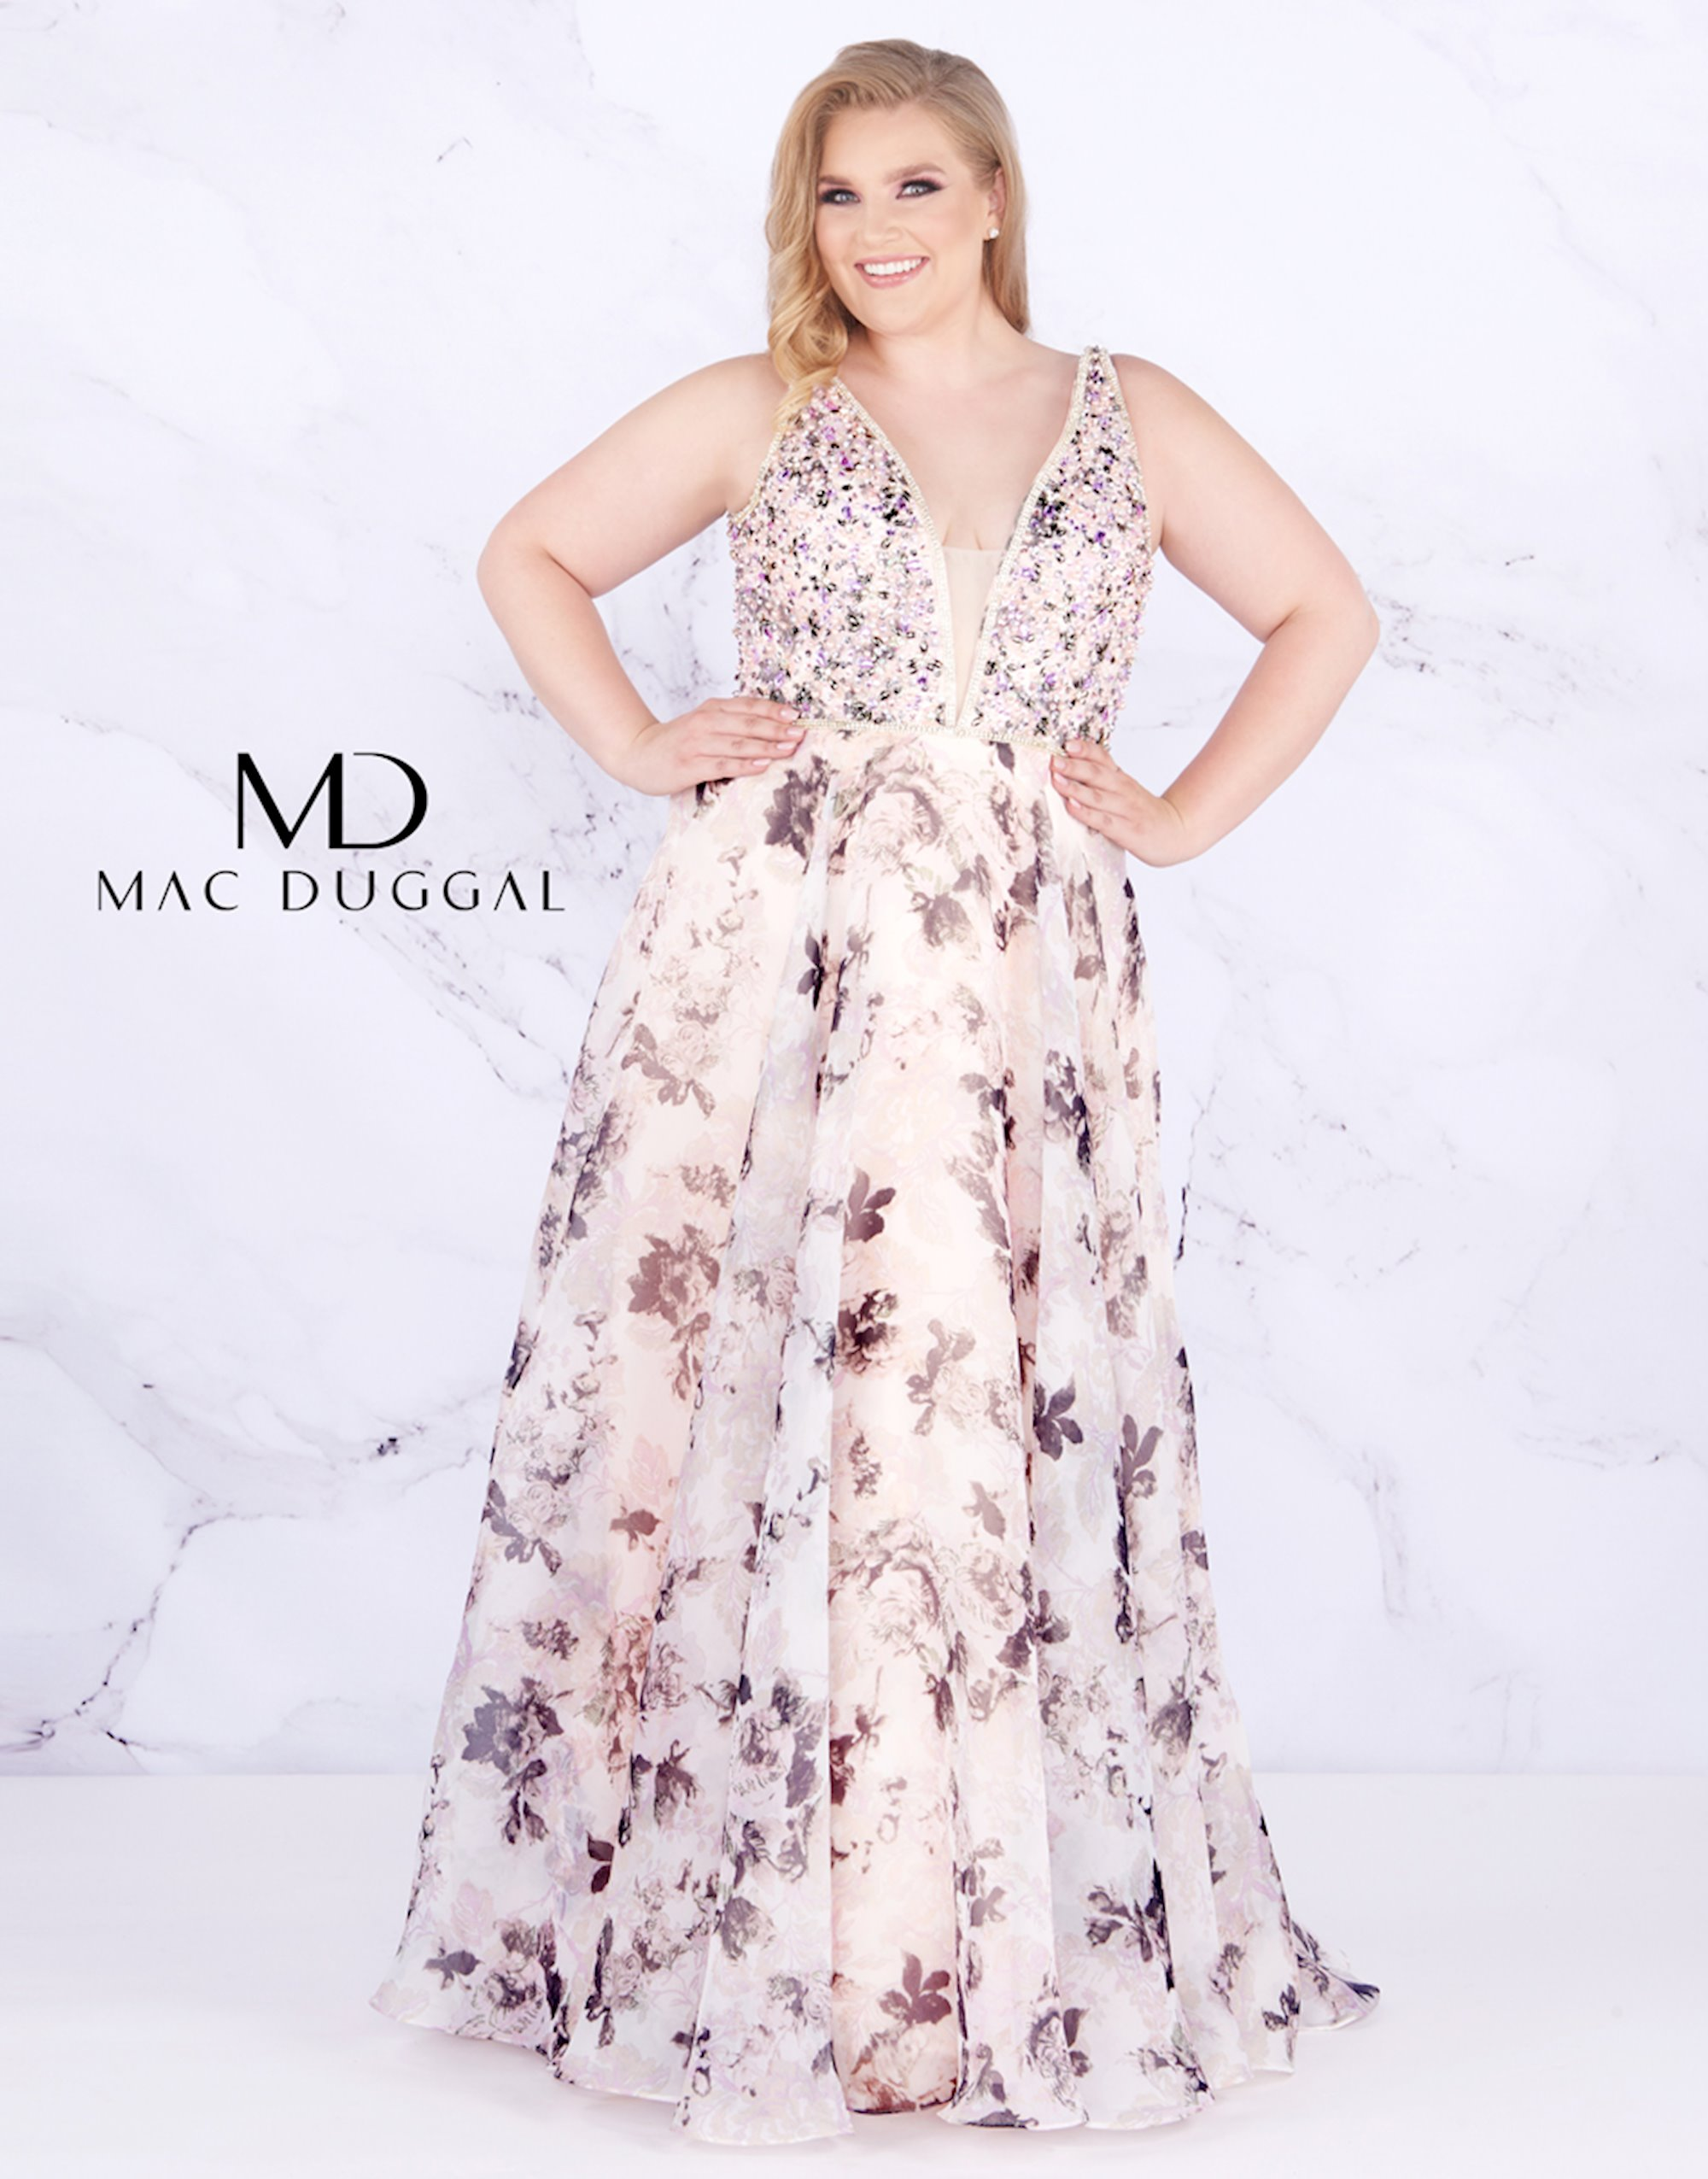 Flower patterned wedding dress